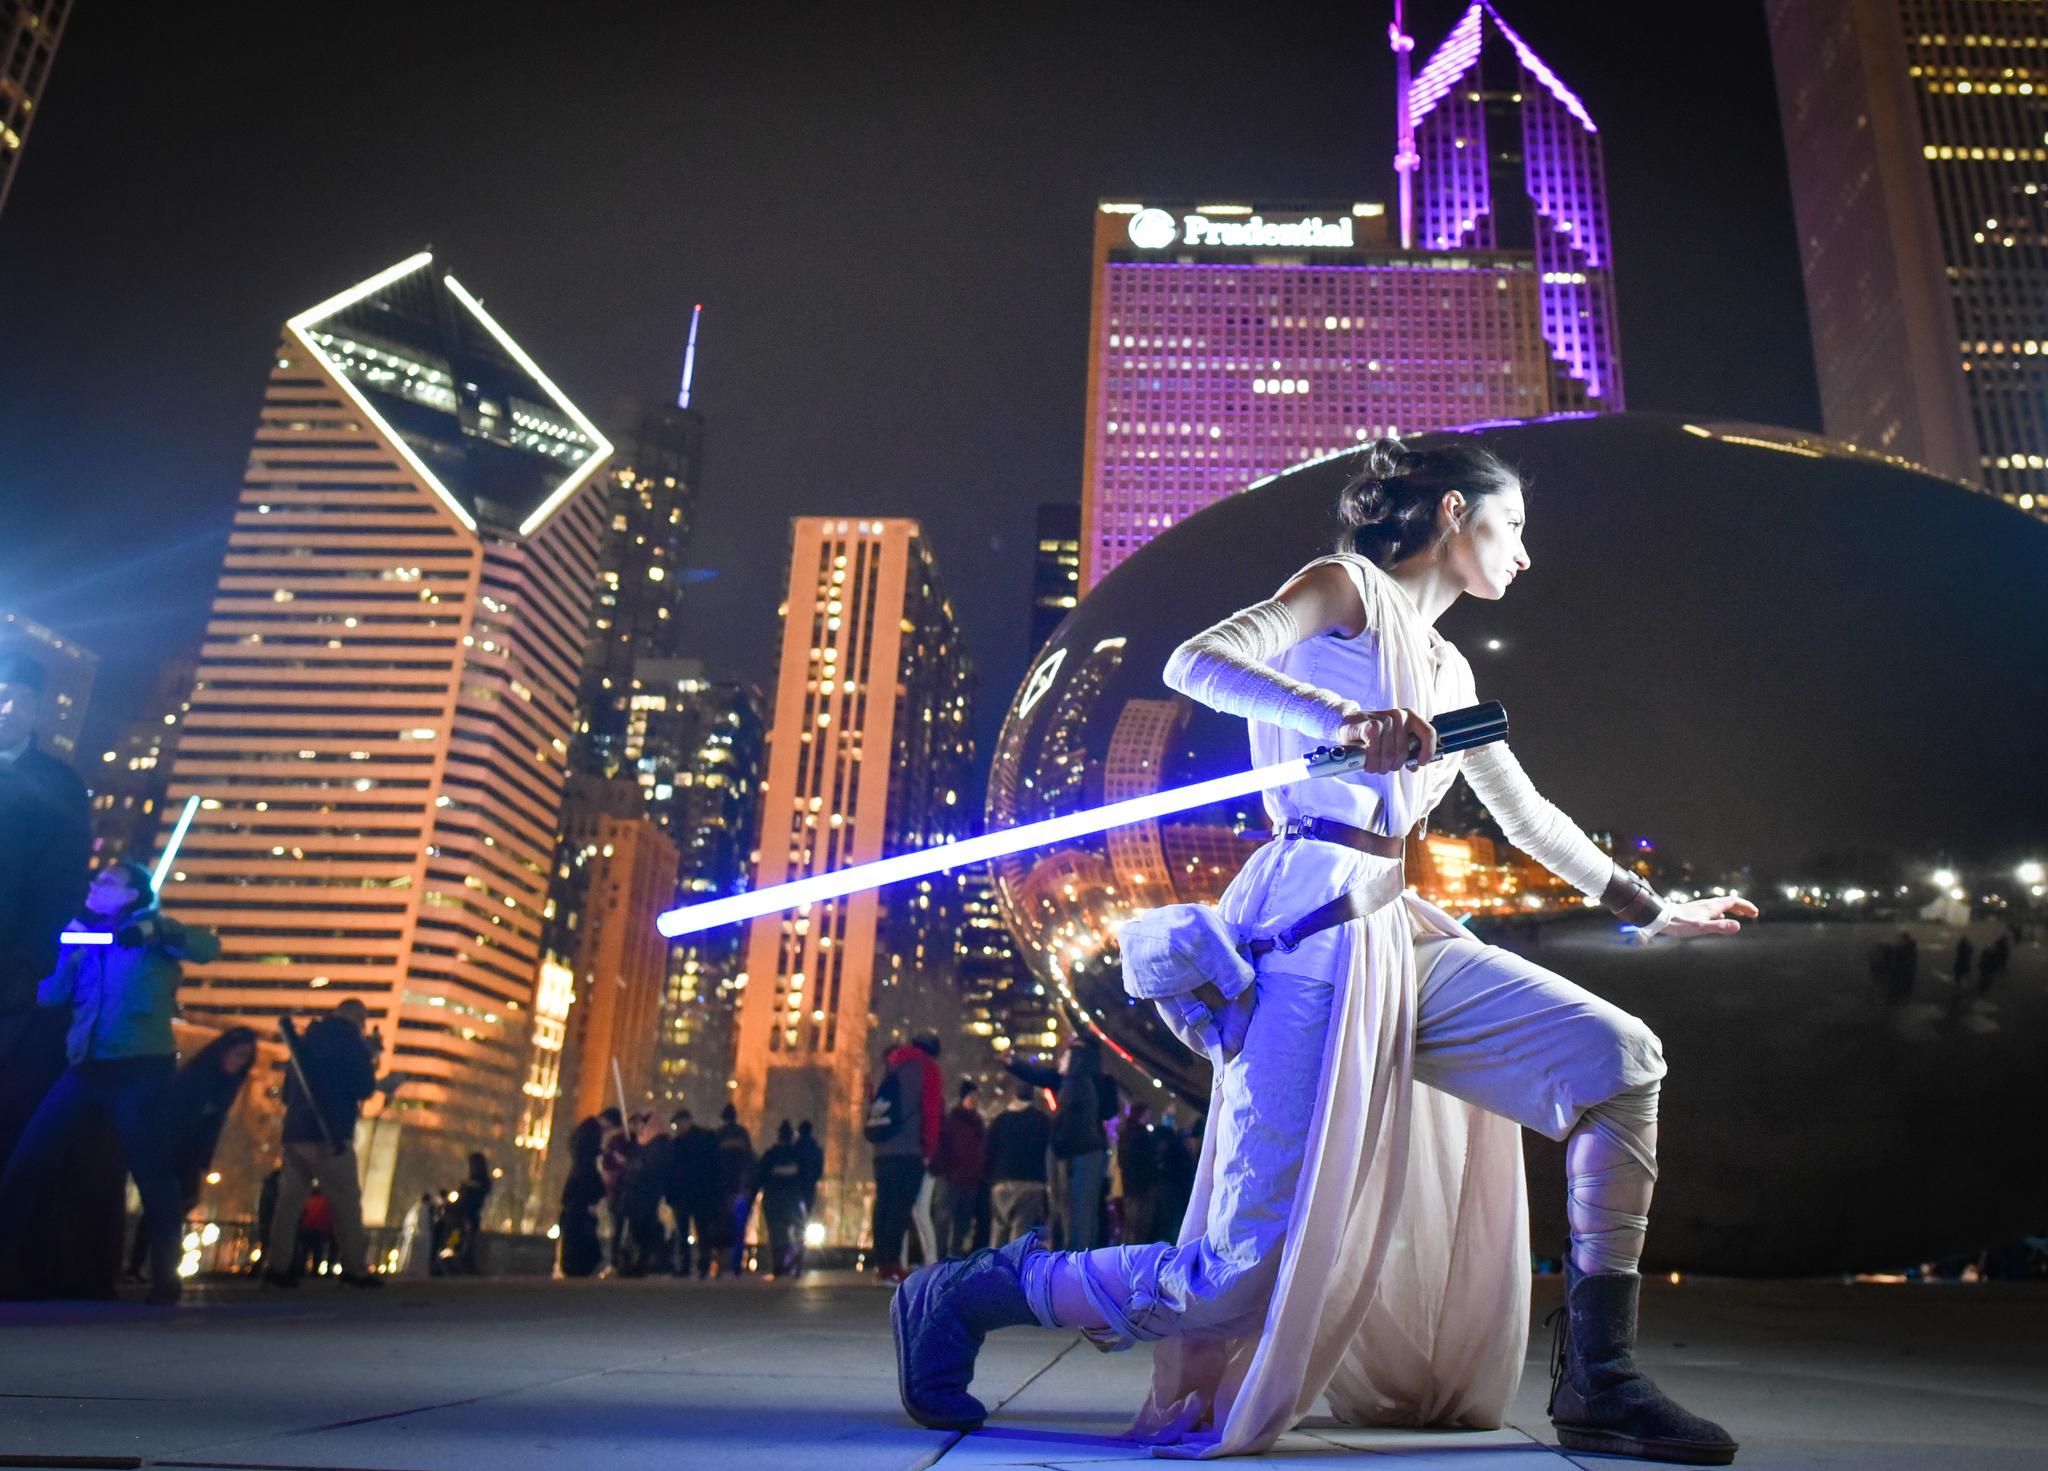 2019.04.14 - Star Wars Celebration Chicago 288899.JPG